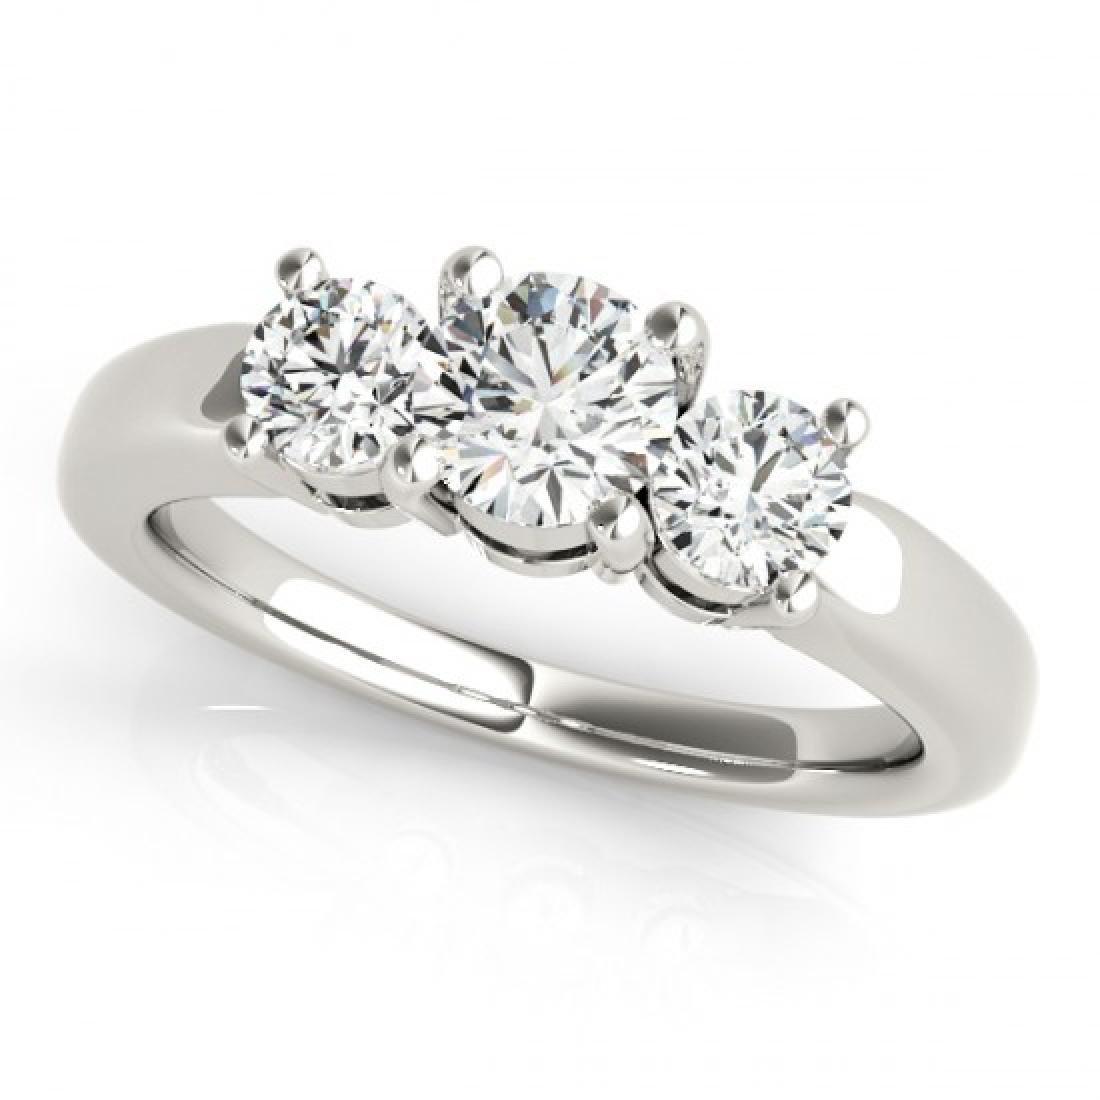 1.45 CTW Certified VS/SI Diamond 3 Stone Ring 14K White - 2